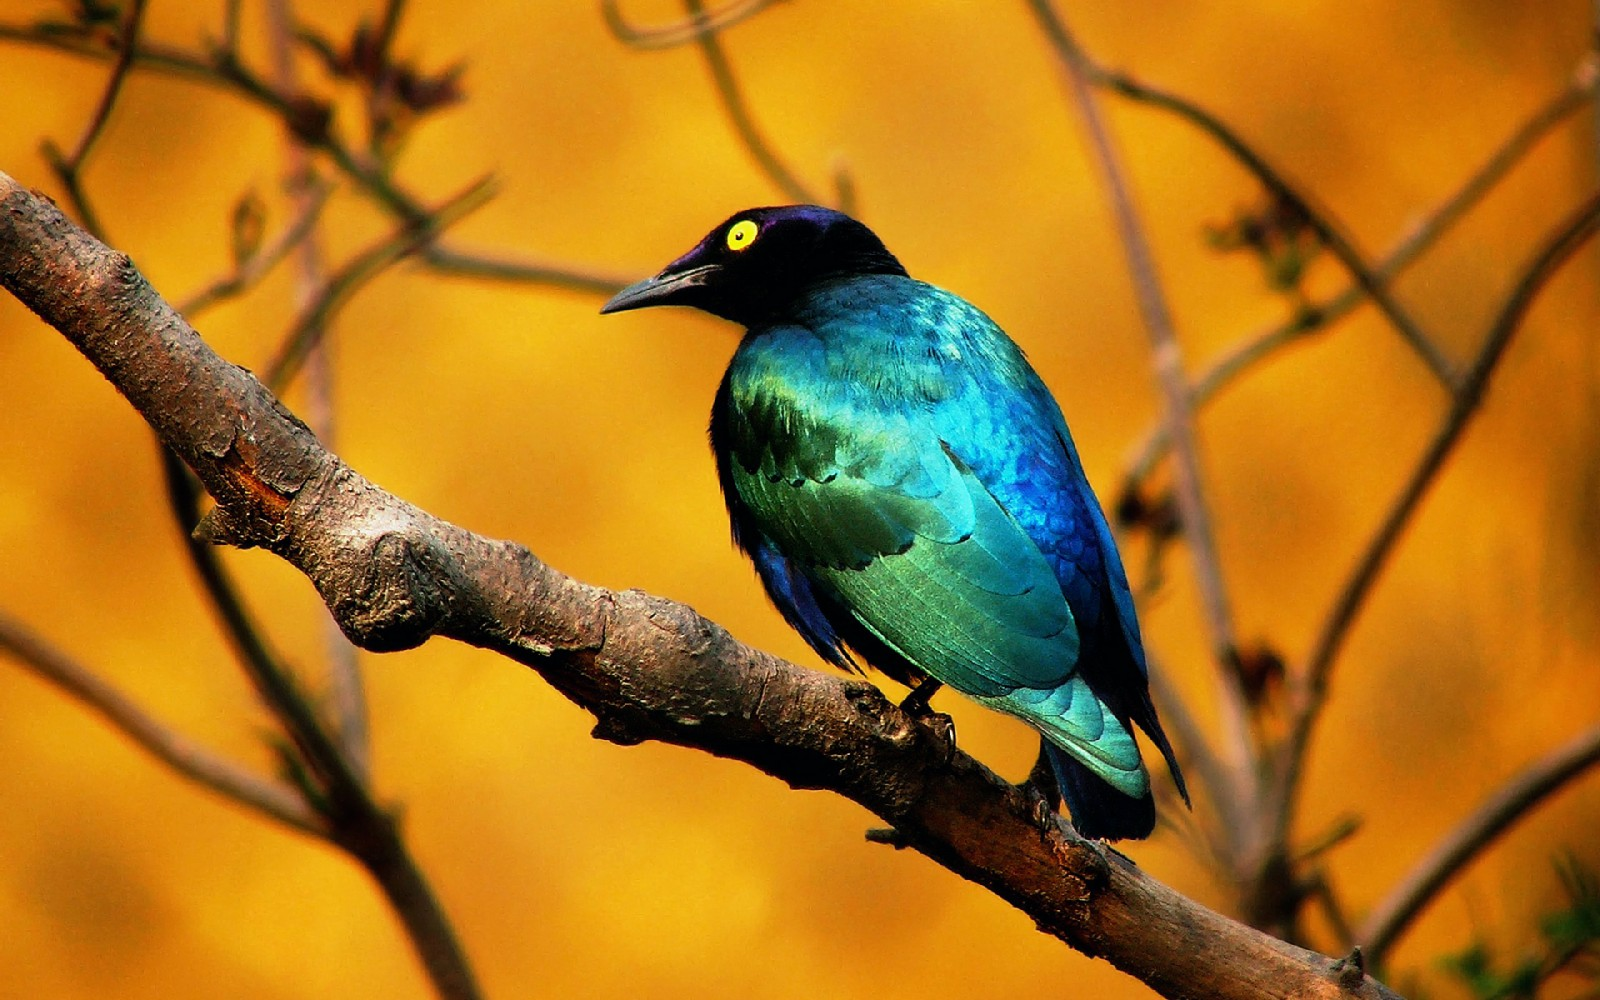 Bird On Tree High Quality HD Wallpaper